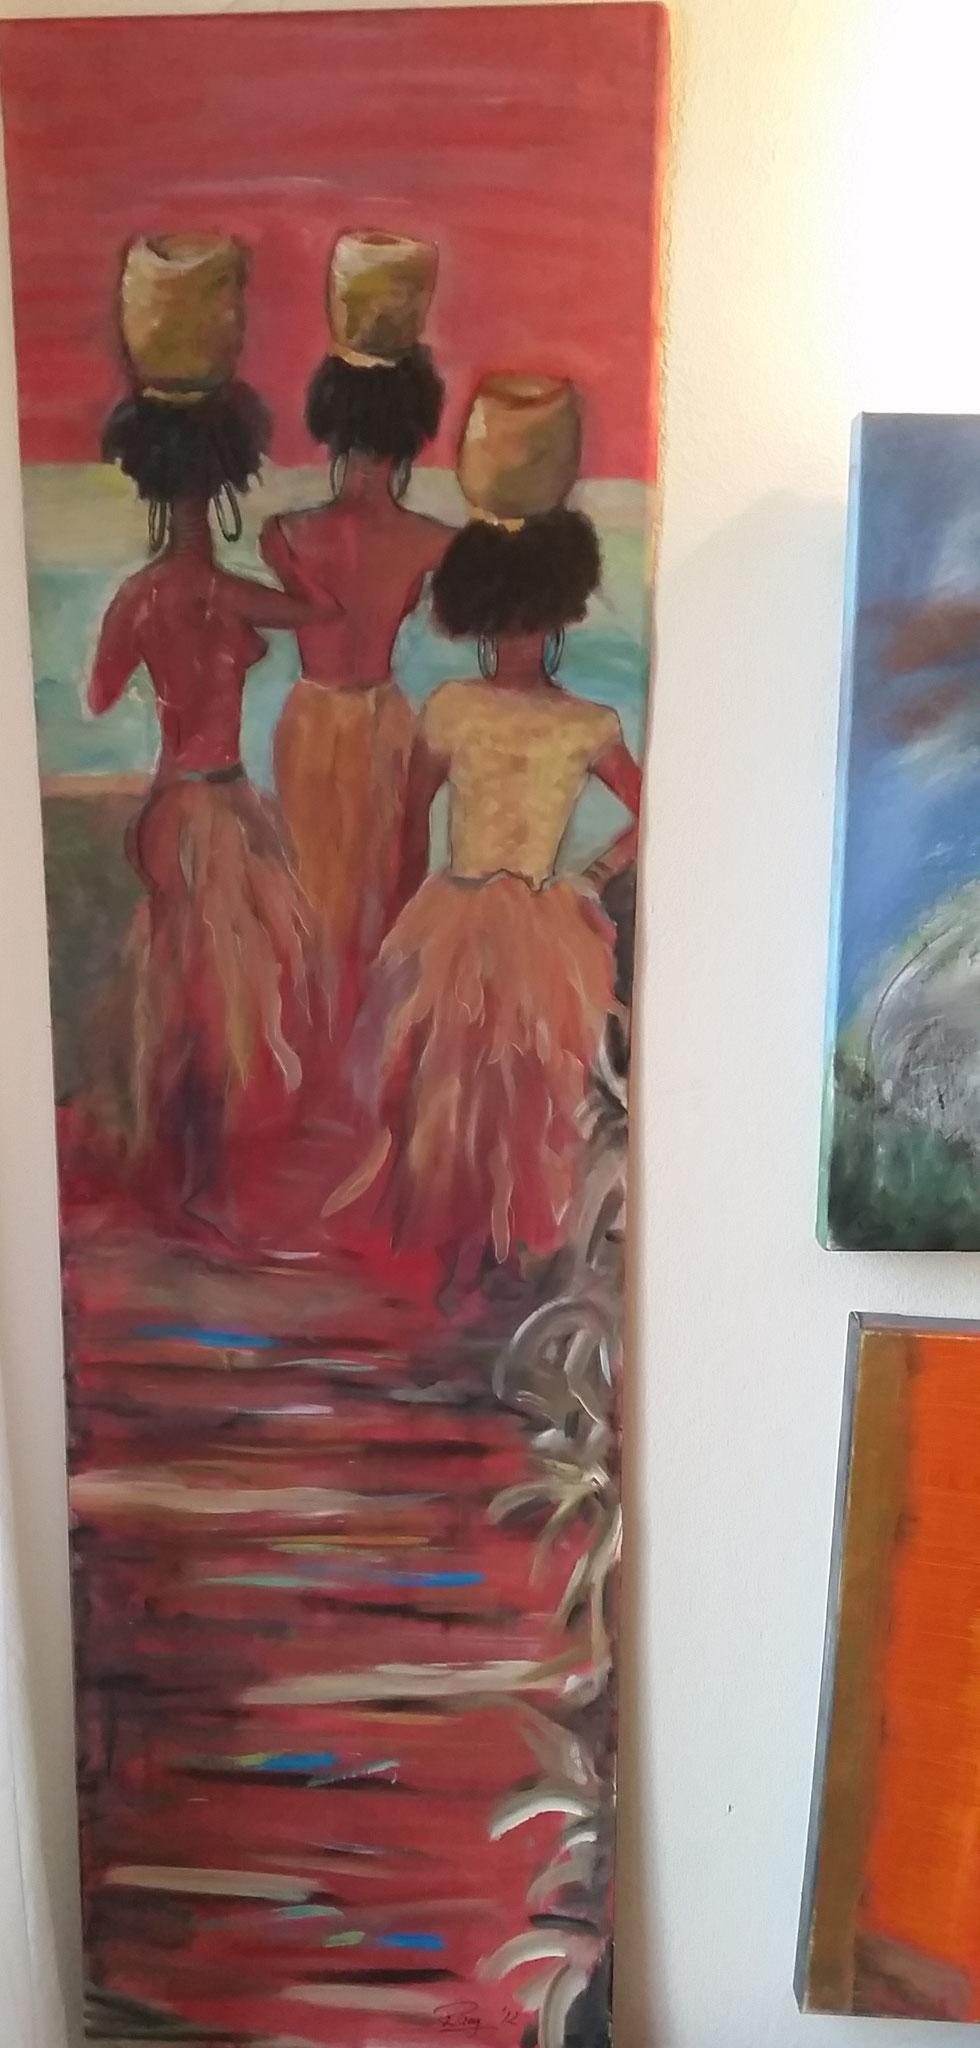 Treppen-Galerie 4, Maler Künstlerin Bozana